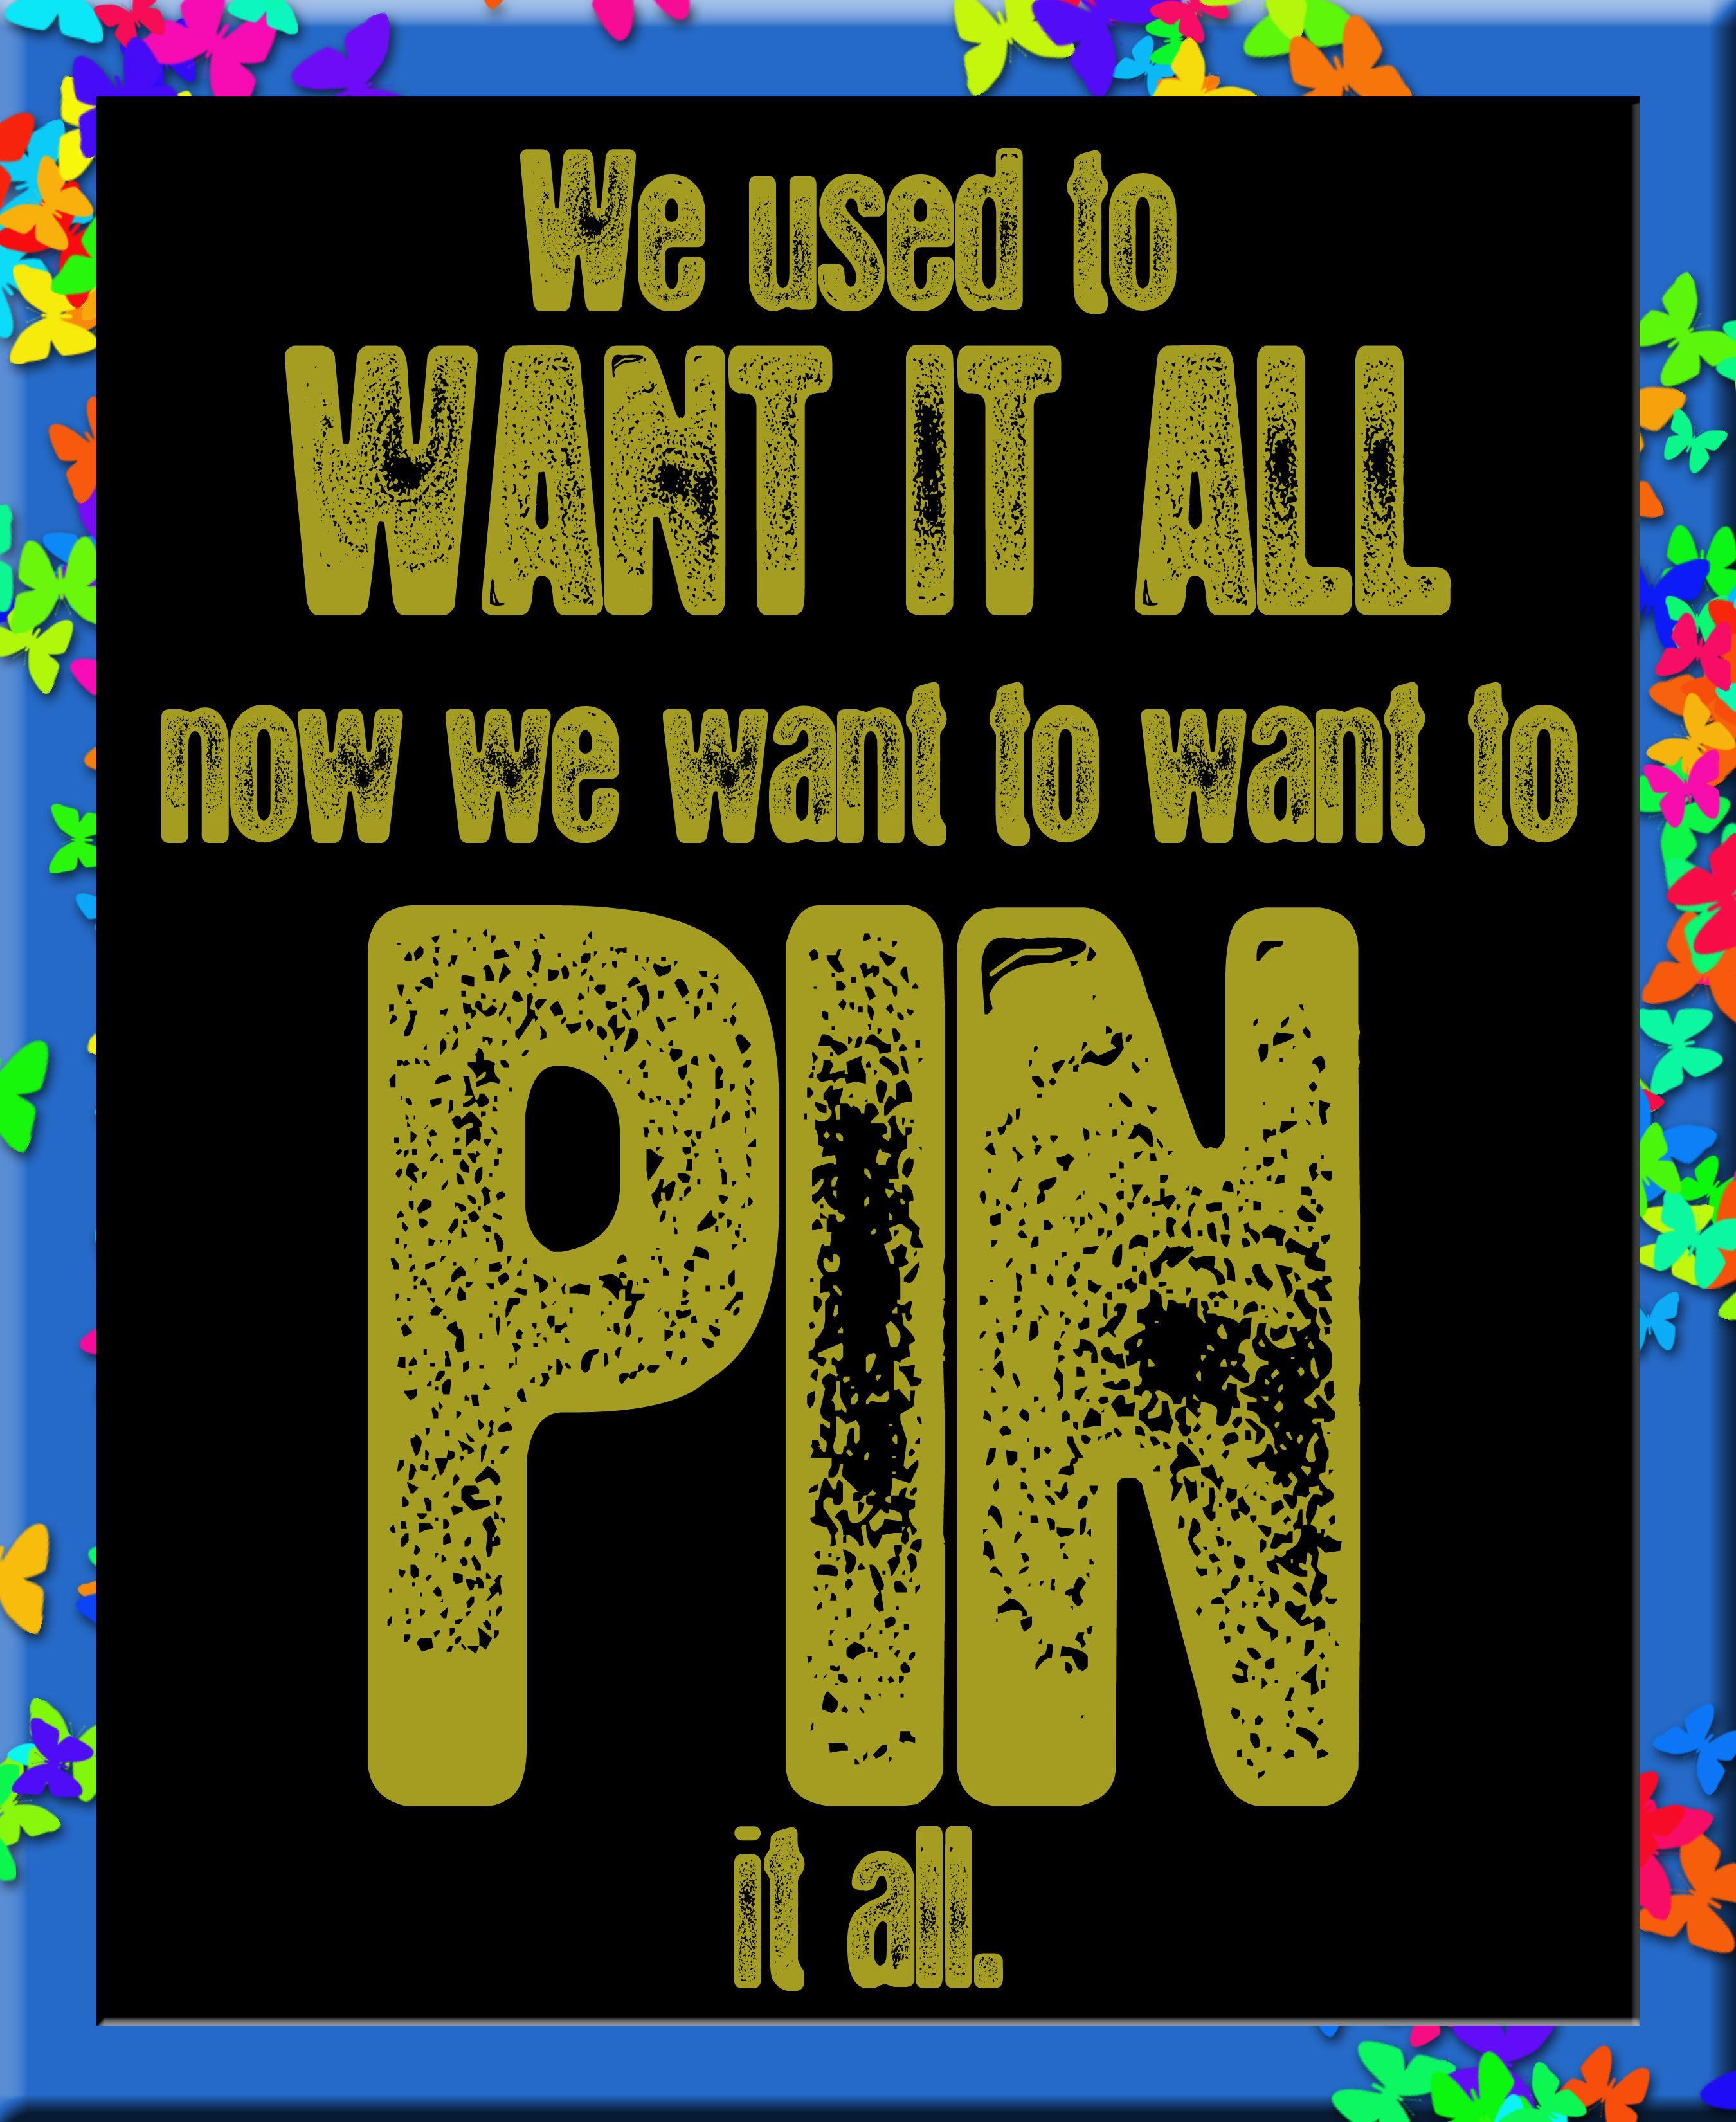 Pin it!!